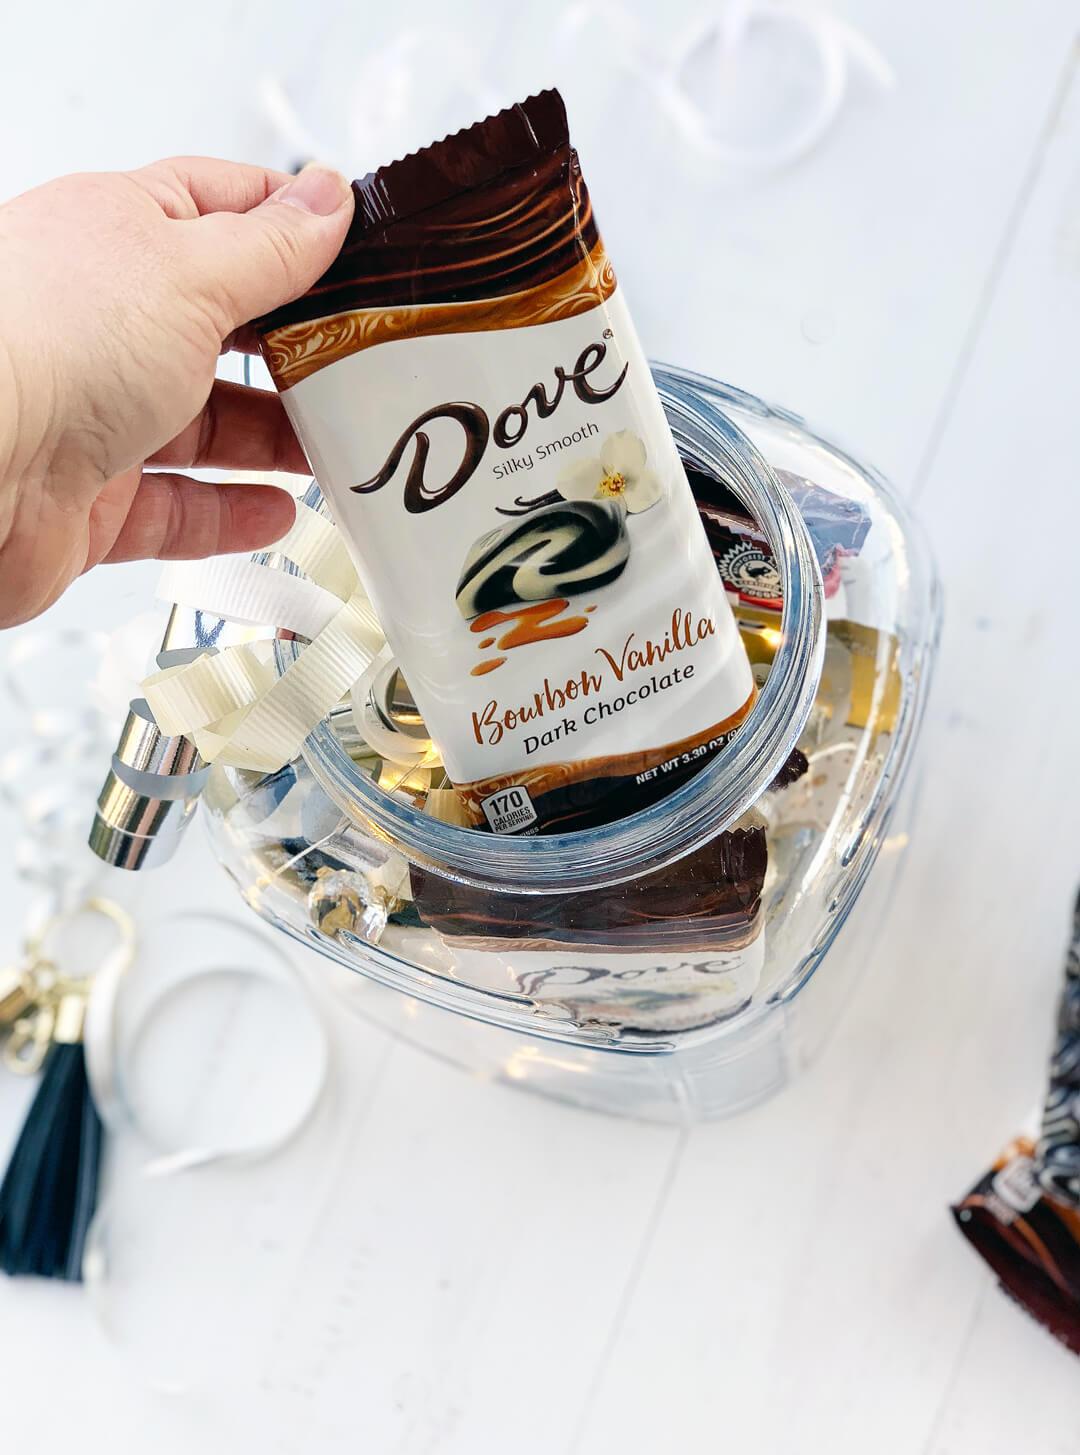 Dove Chocolate Bourbon Vanilla